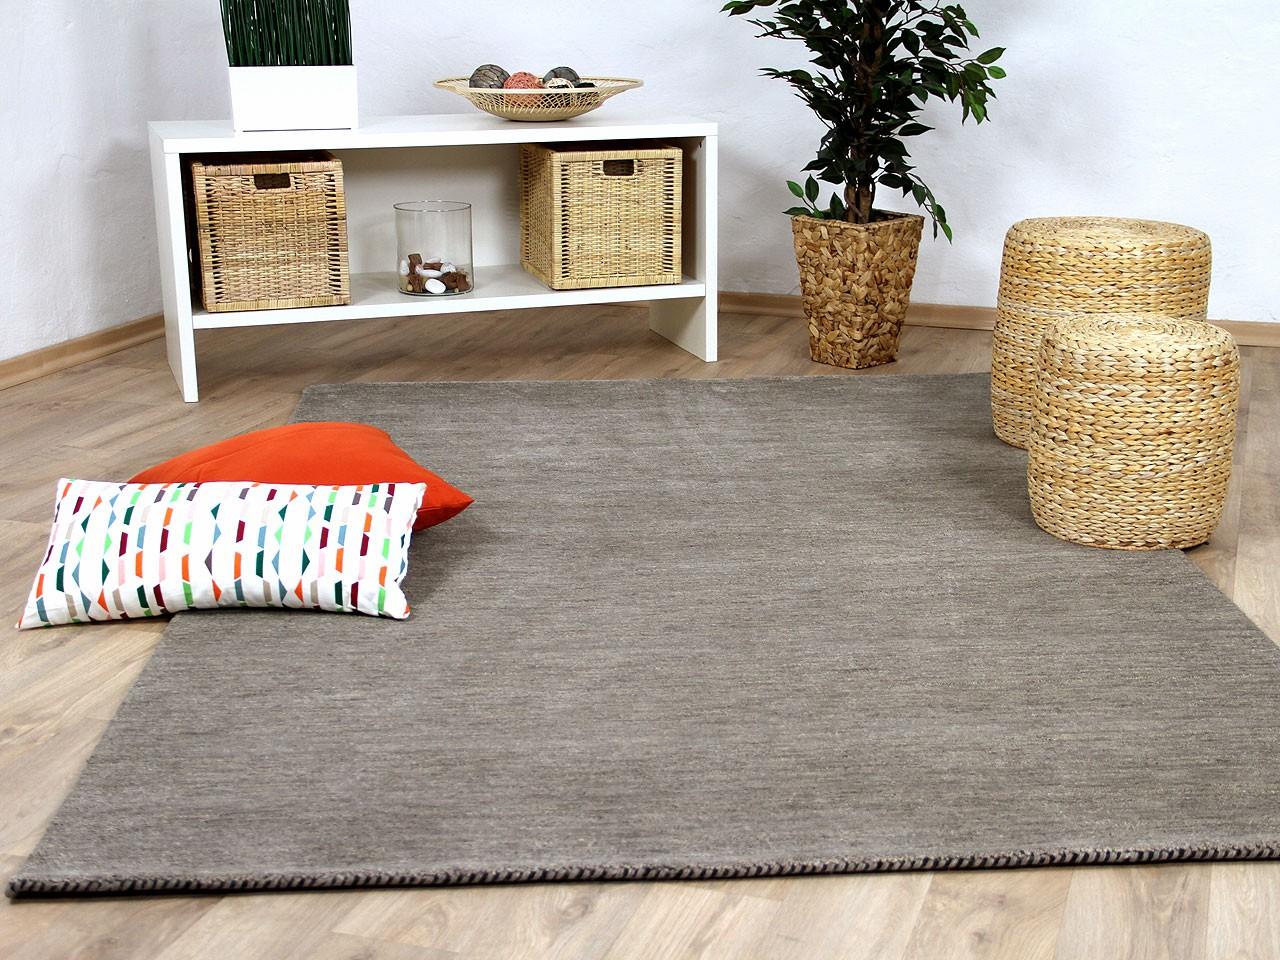 natur teppich indo gabbeh ella grau teppiche nepal gabbeh und kelim teppiche indo gabbeh teppiche. Black Bedroom Furniture Sets. Home Design Ideas